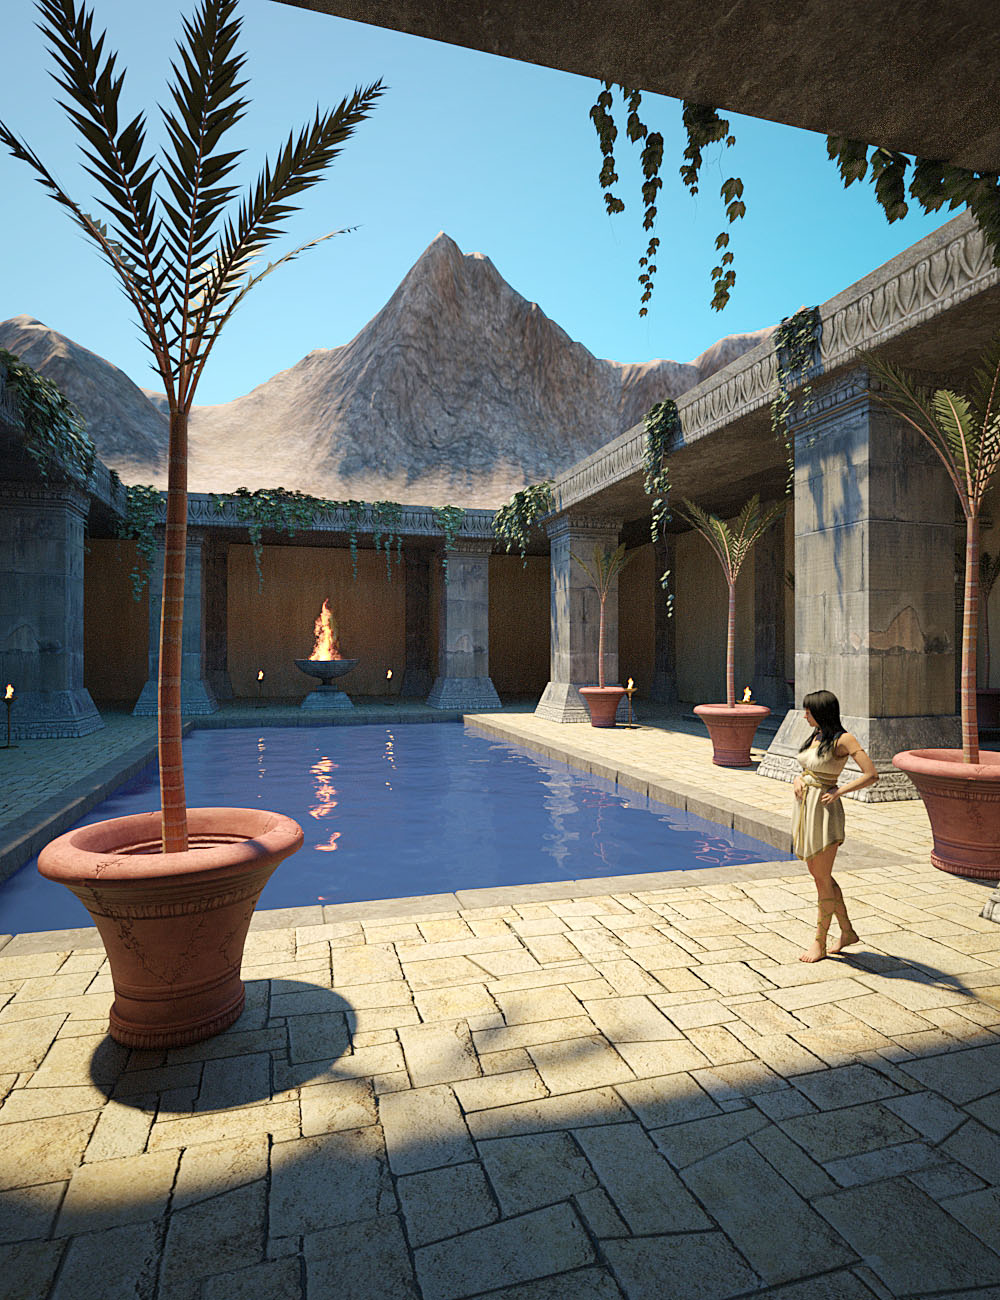 Ancient Temple Courtyard by: bitwelder, 3D Models by Daz 3D